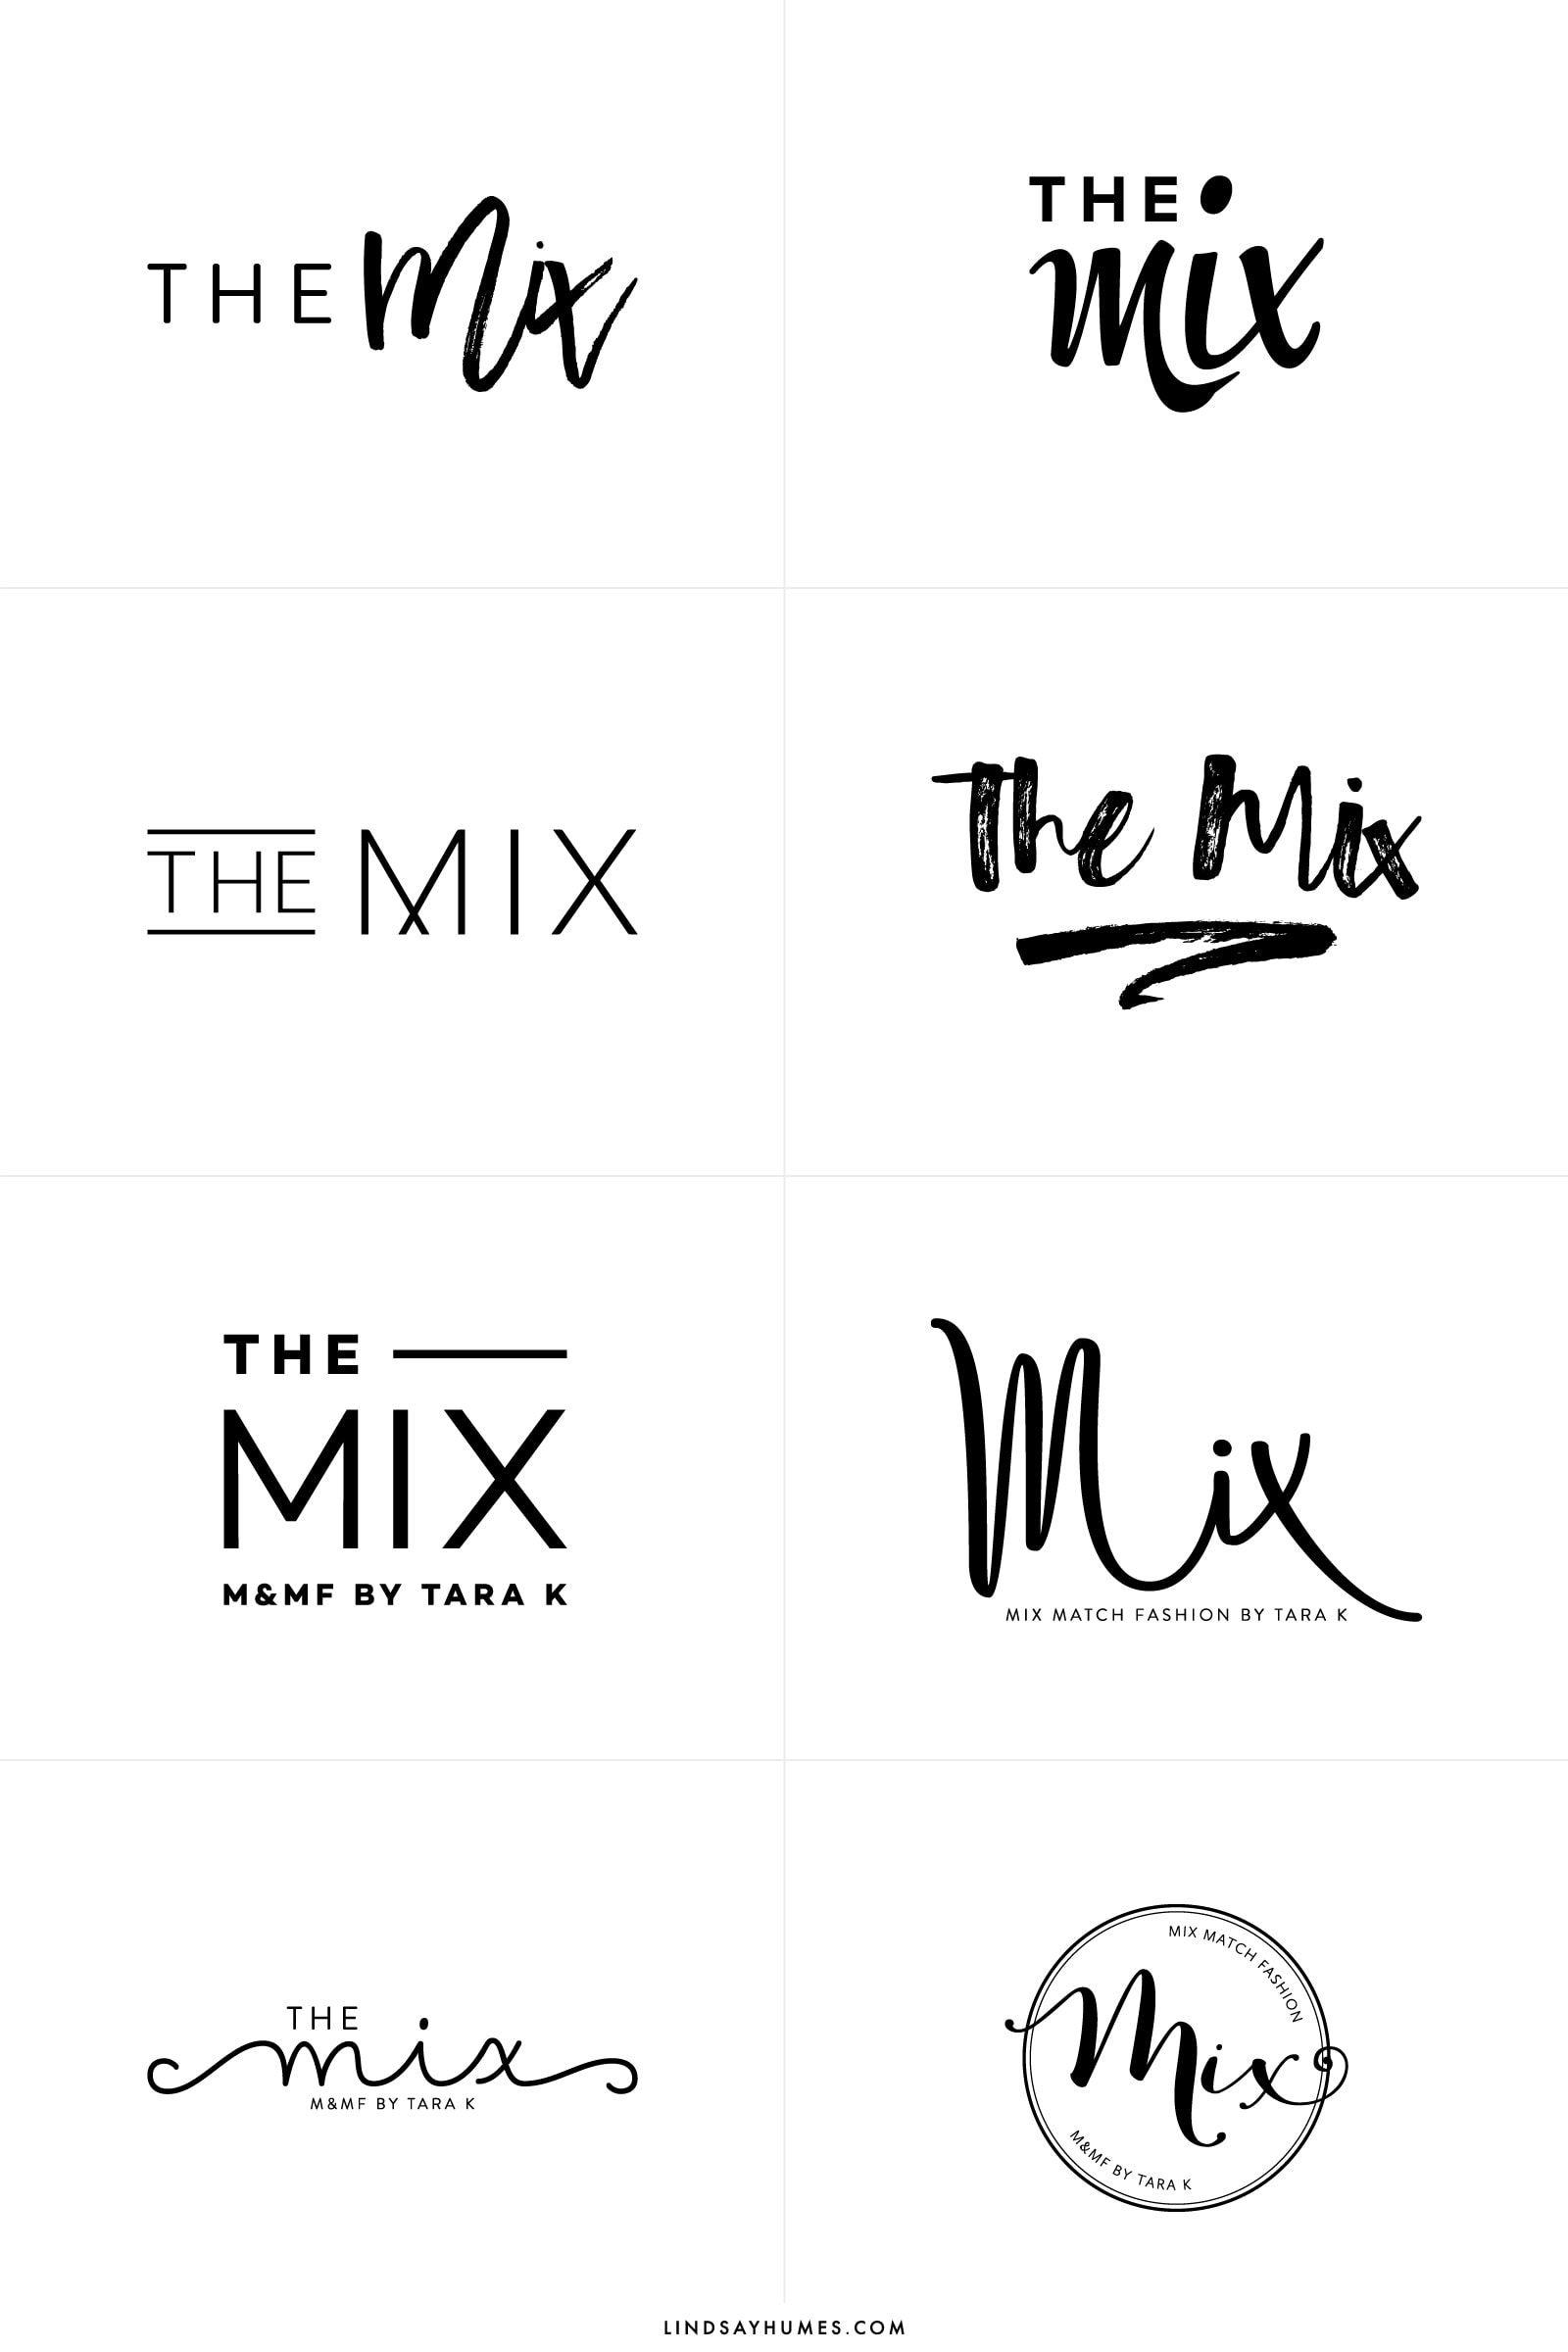 The Mix by Tara | Blog designs, Mood boards and Wordpress